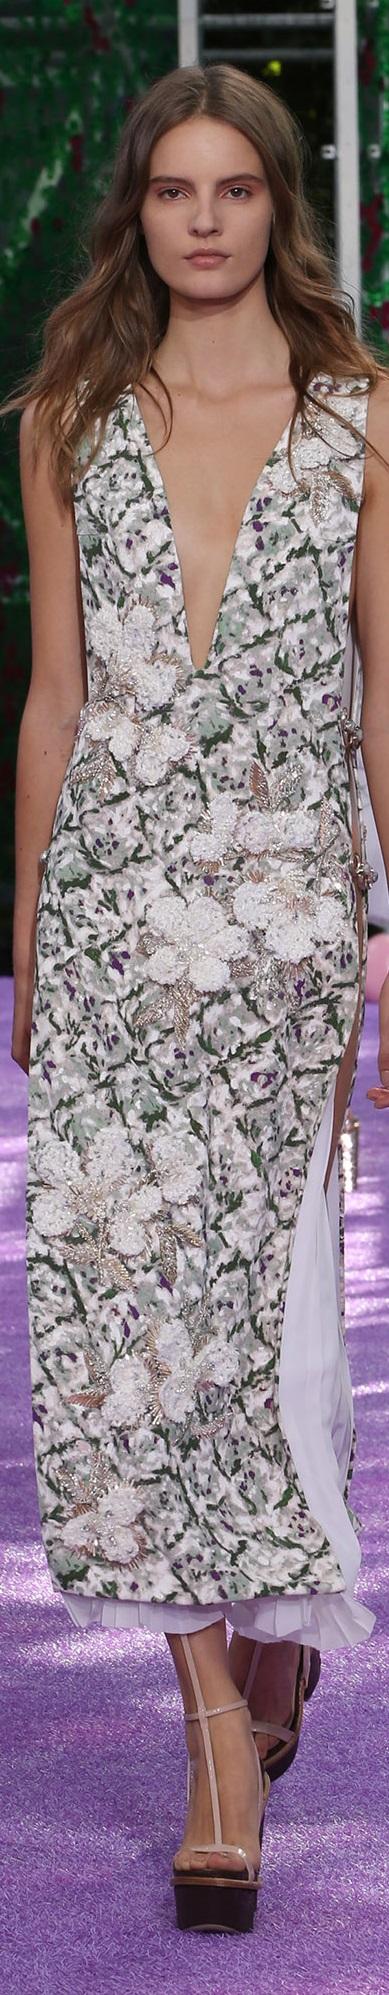 Cristian Dior fall 2015 couture www.dior.com